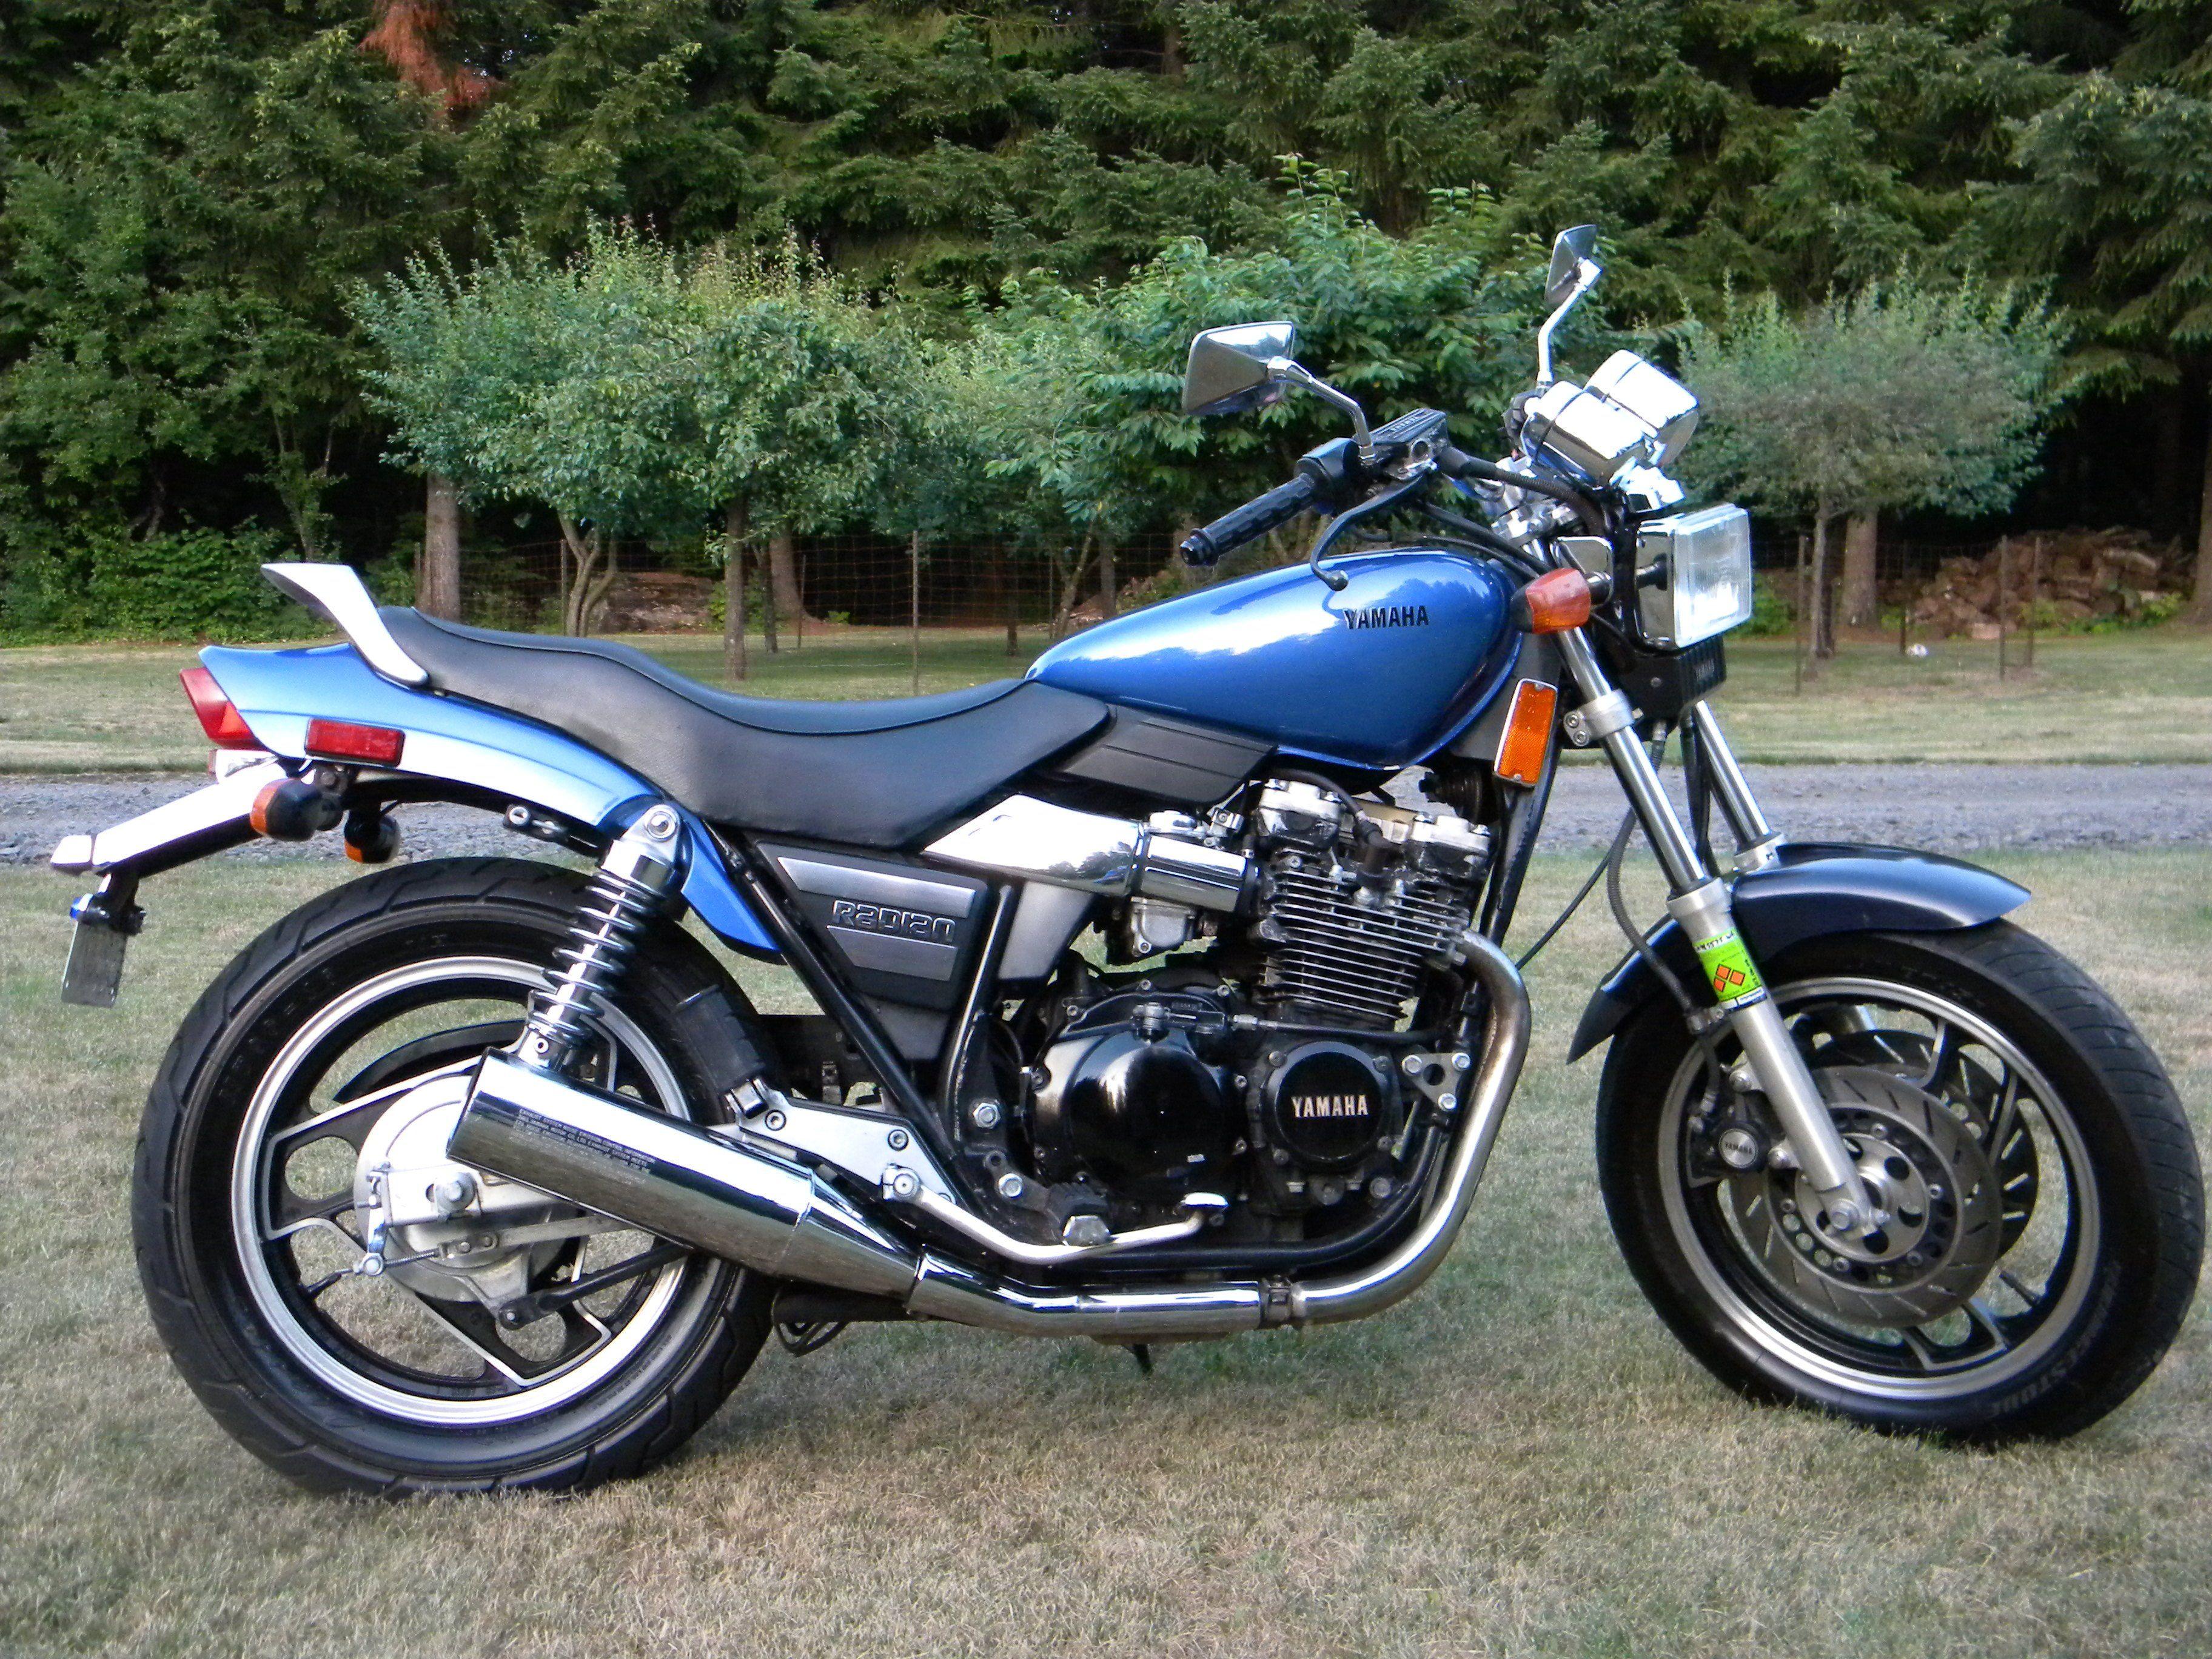 Yamaha Classic Bikes In India